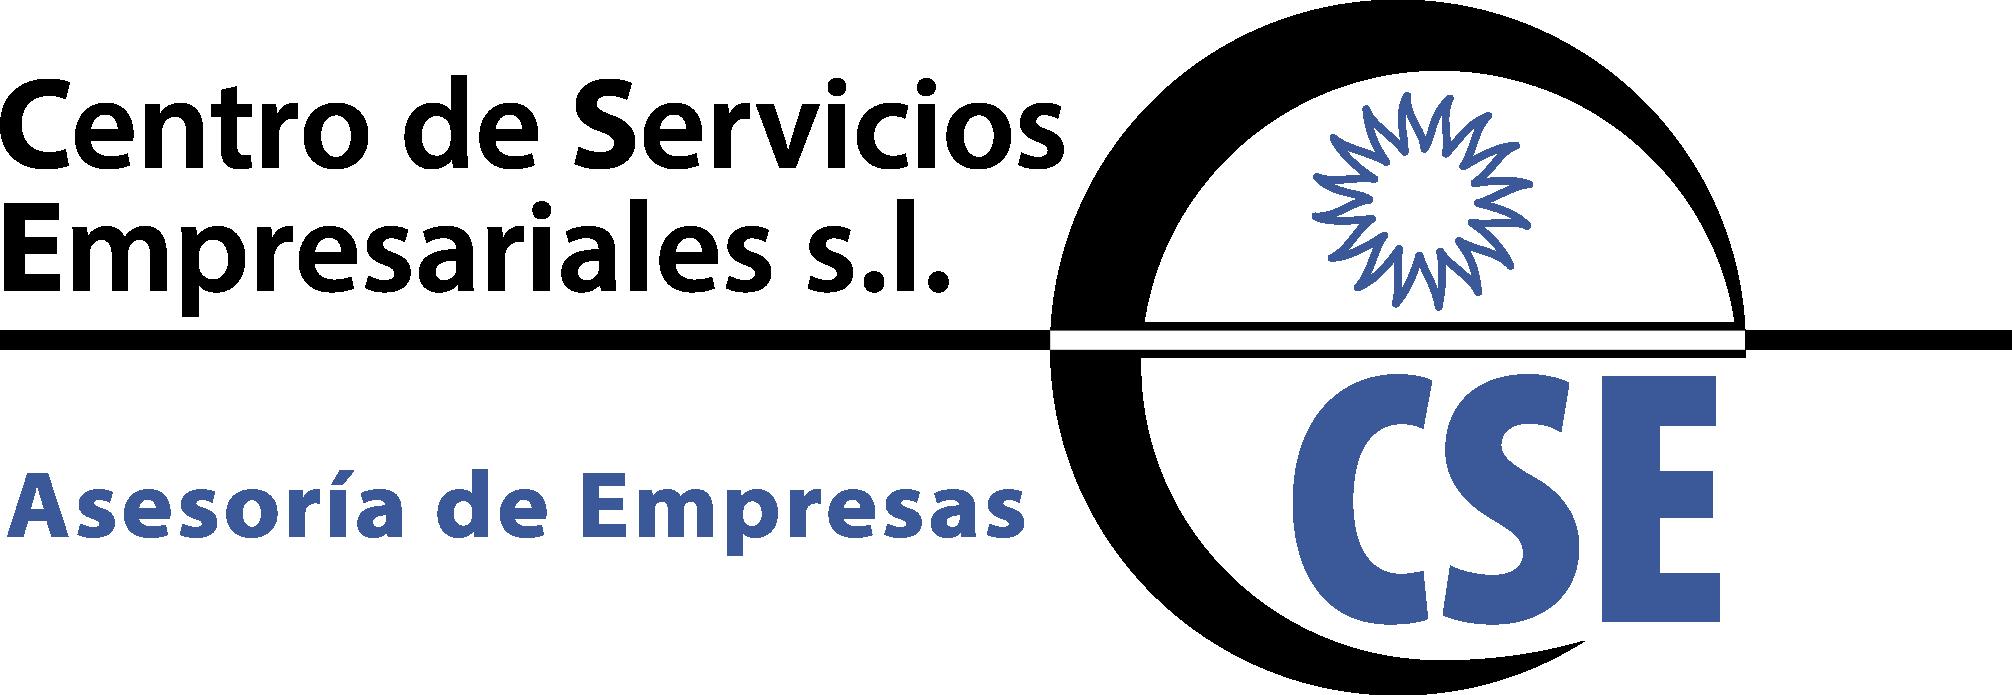 CSE-ASESORIA Logo